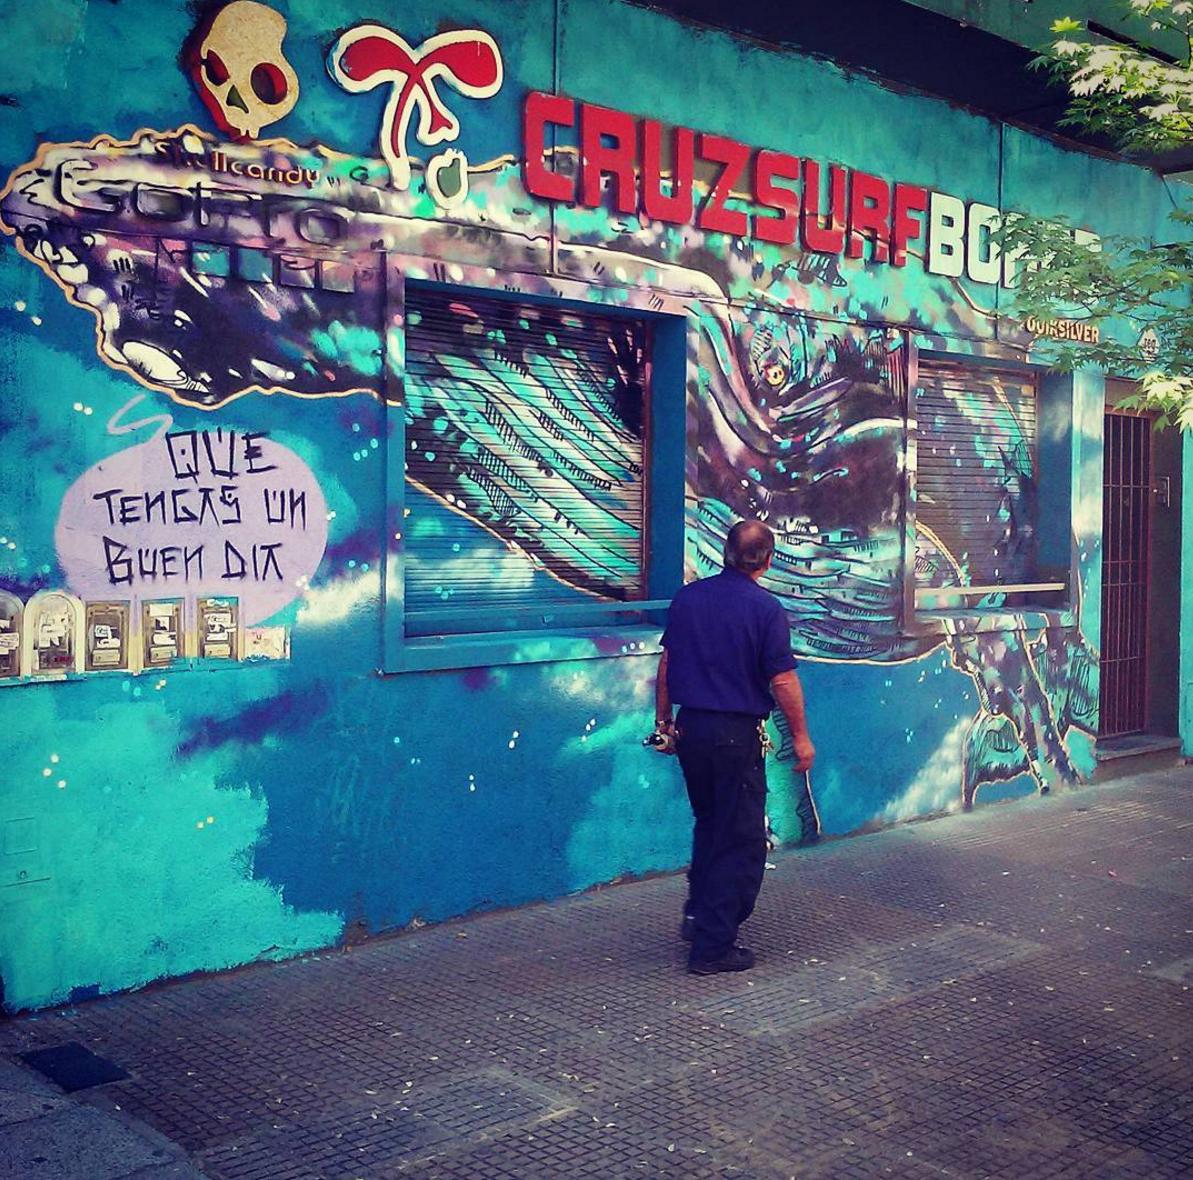 surf shop ba, 2016 (3).png